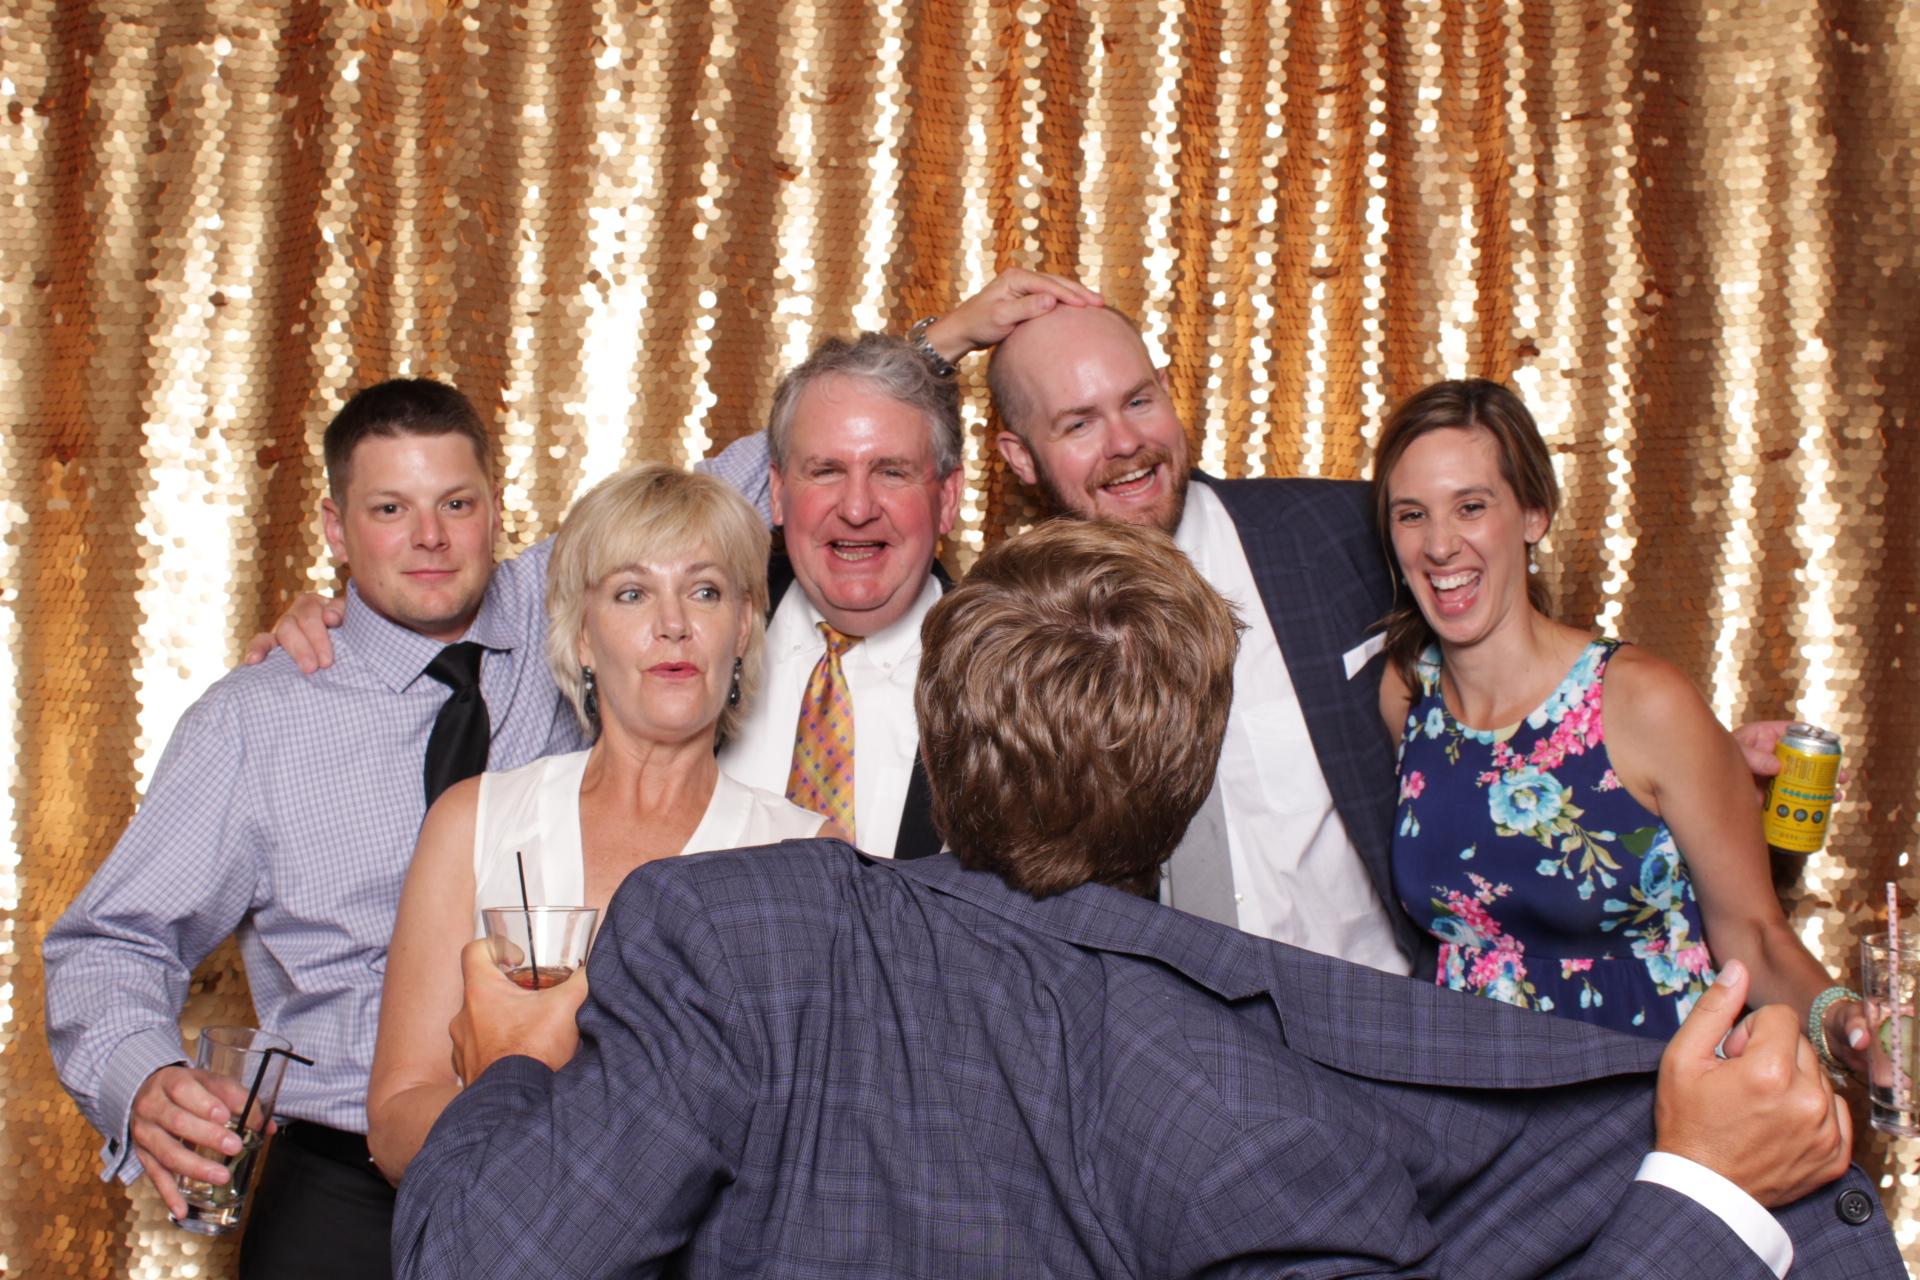 Minneapolis_wedding_photo_booth_Machine_Shop (10).jpg